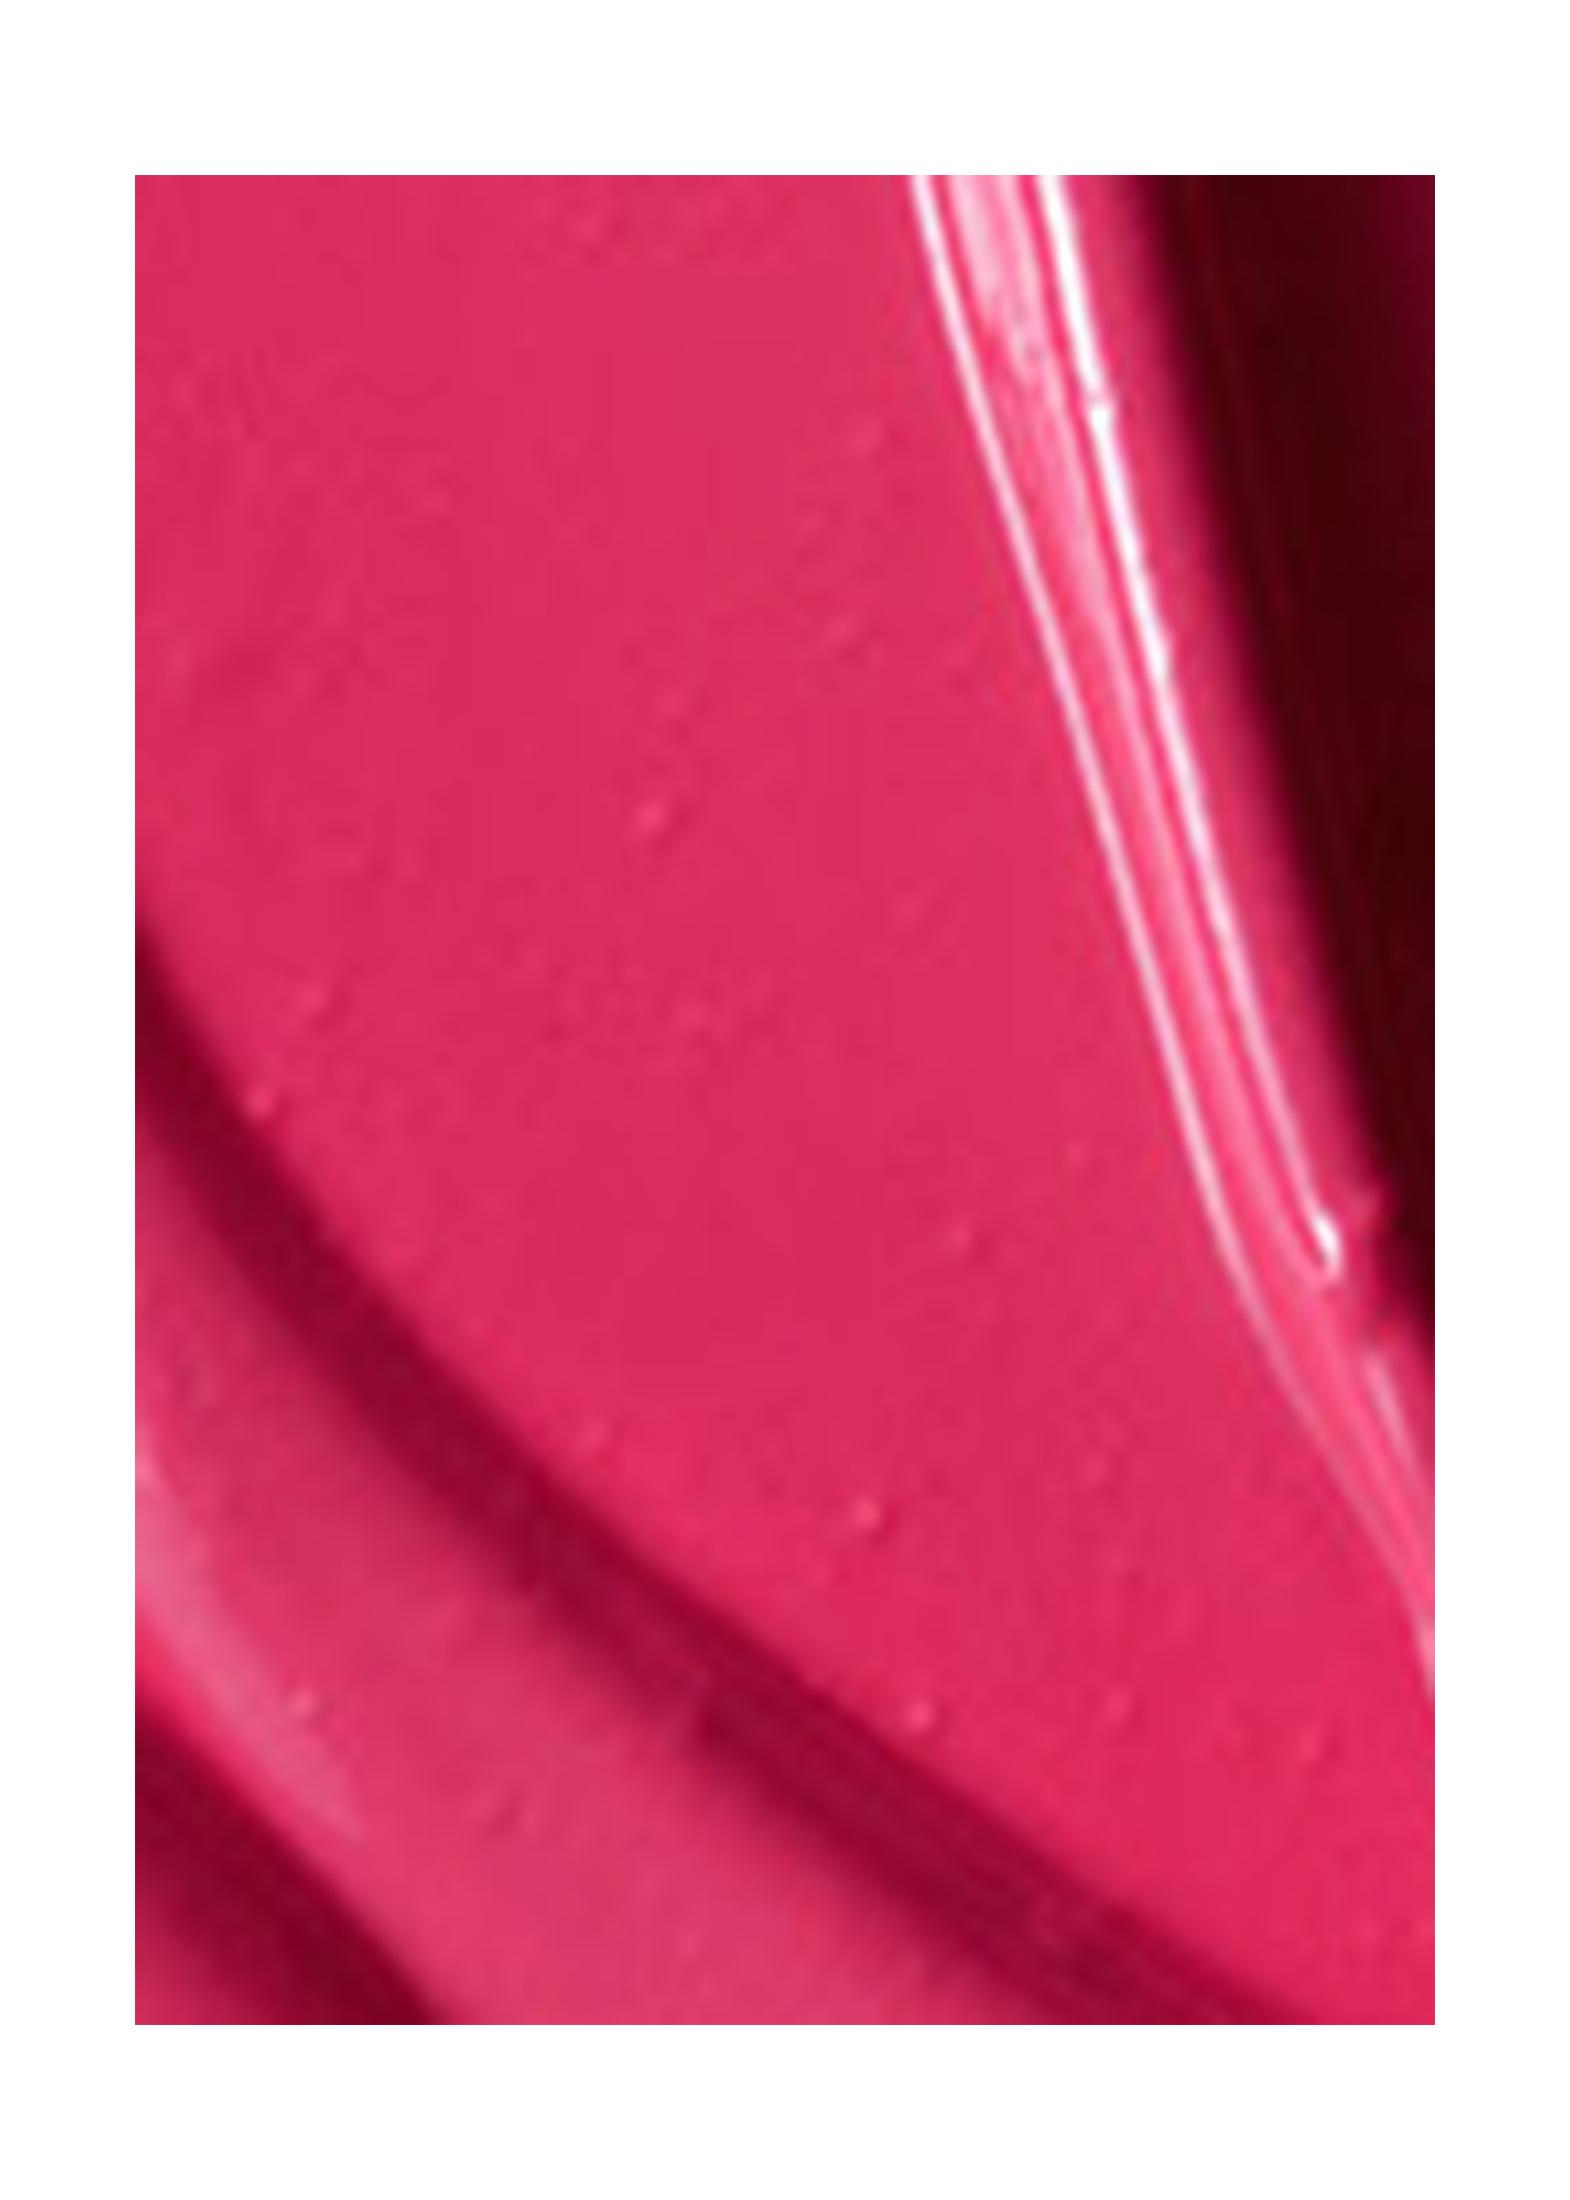 Lippenstift Plexi Pink 8,5 g image number 2